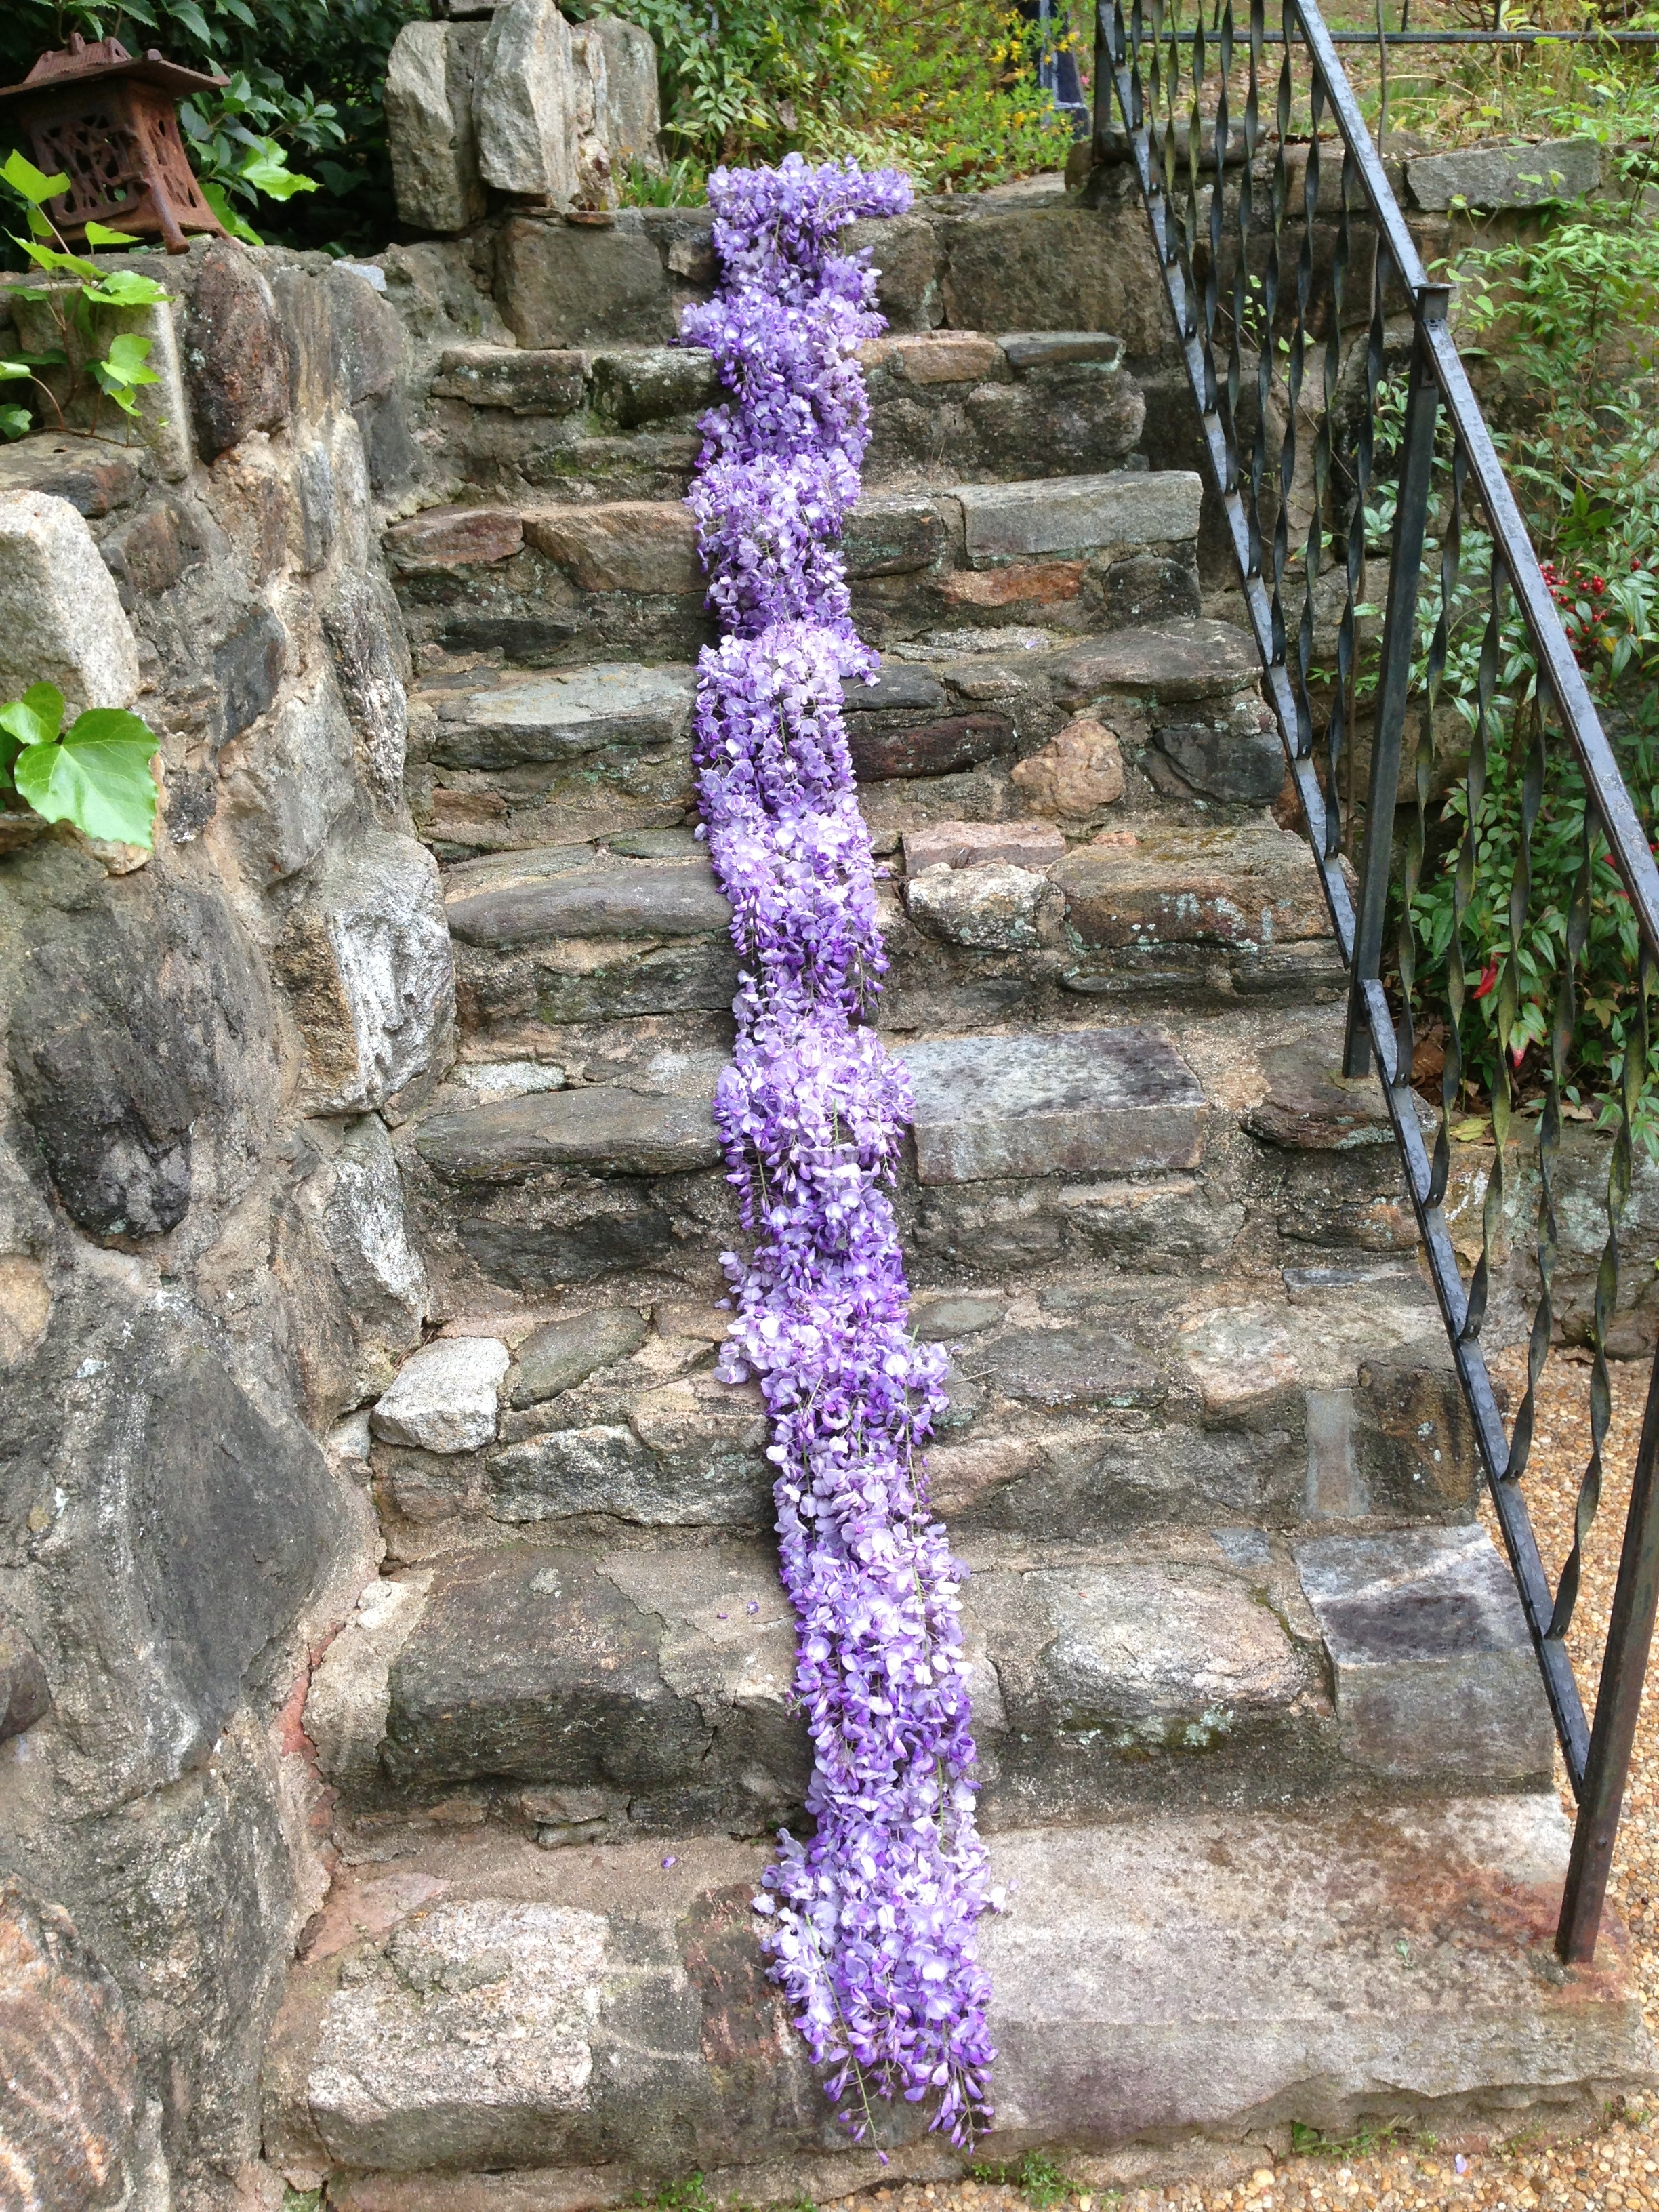 Wisteria flowers on stairs. Athens, GA. Spring 2013